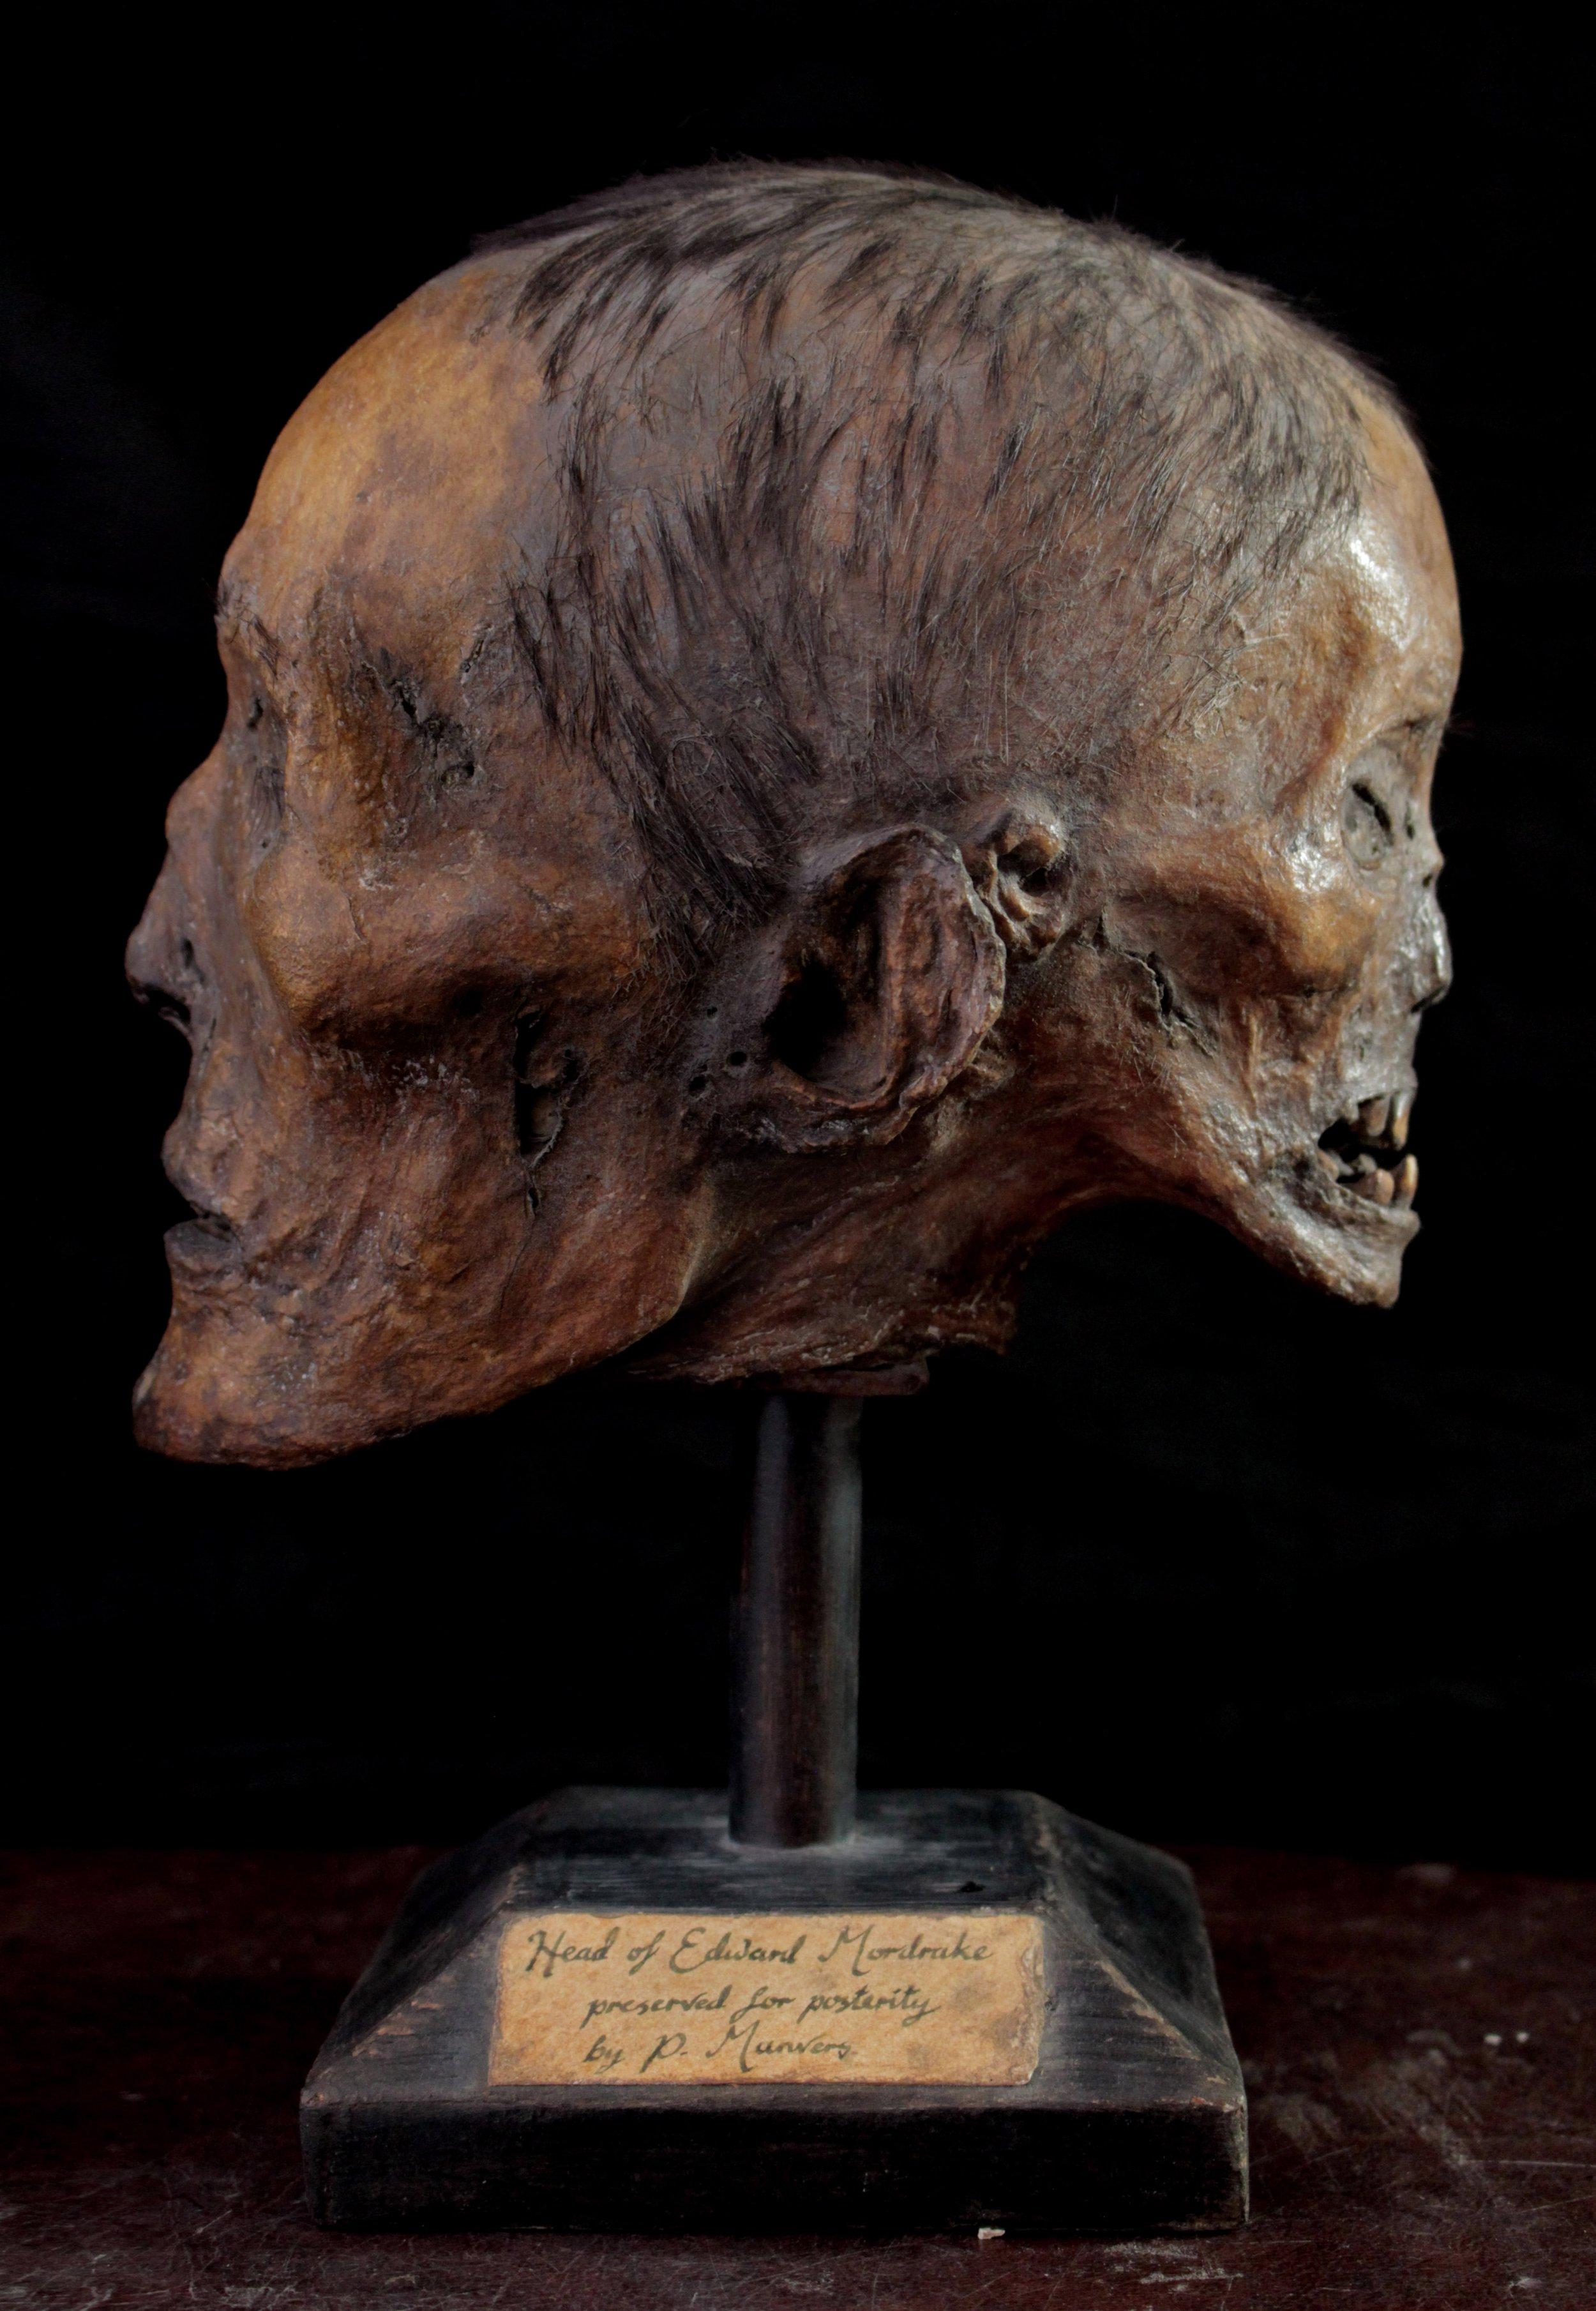 Edward Mordrake's head